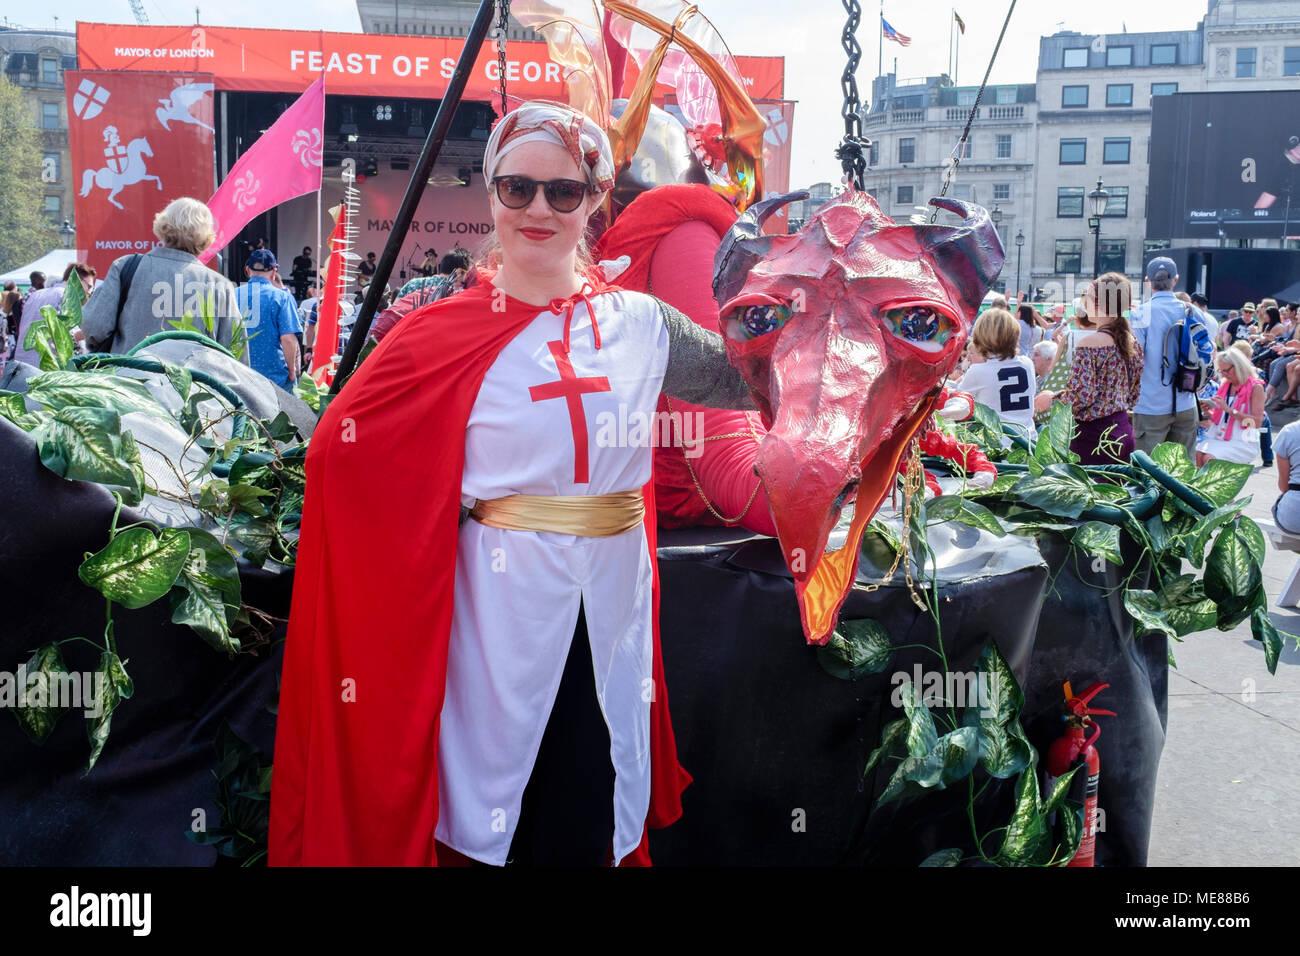 London, UK. 21 April 2018. Feast of St. George, patron saint of England celebrated in Trafalgar Square, London, UK - Stock Image